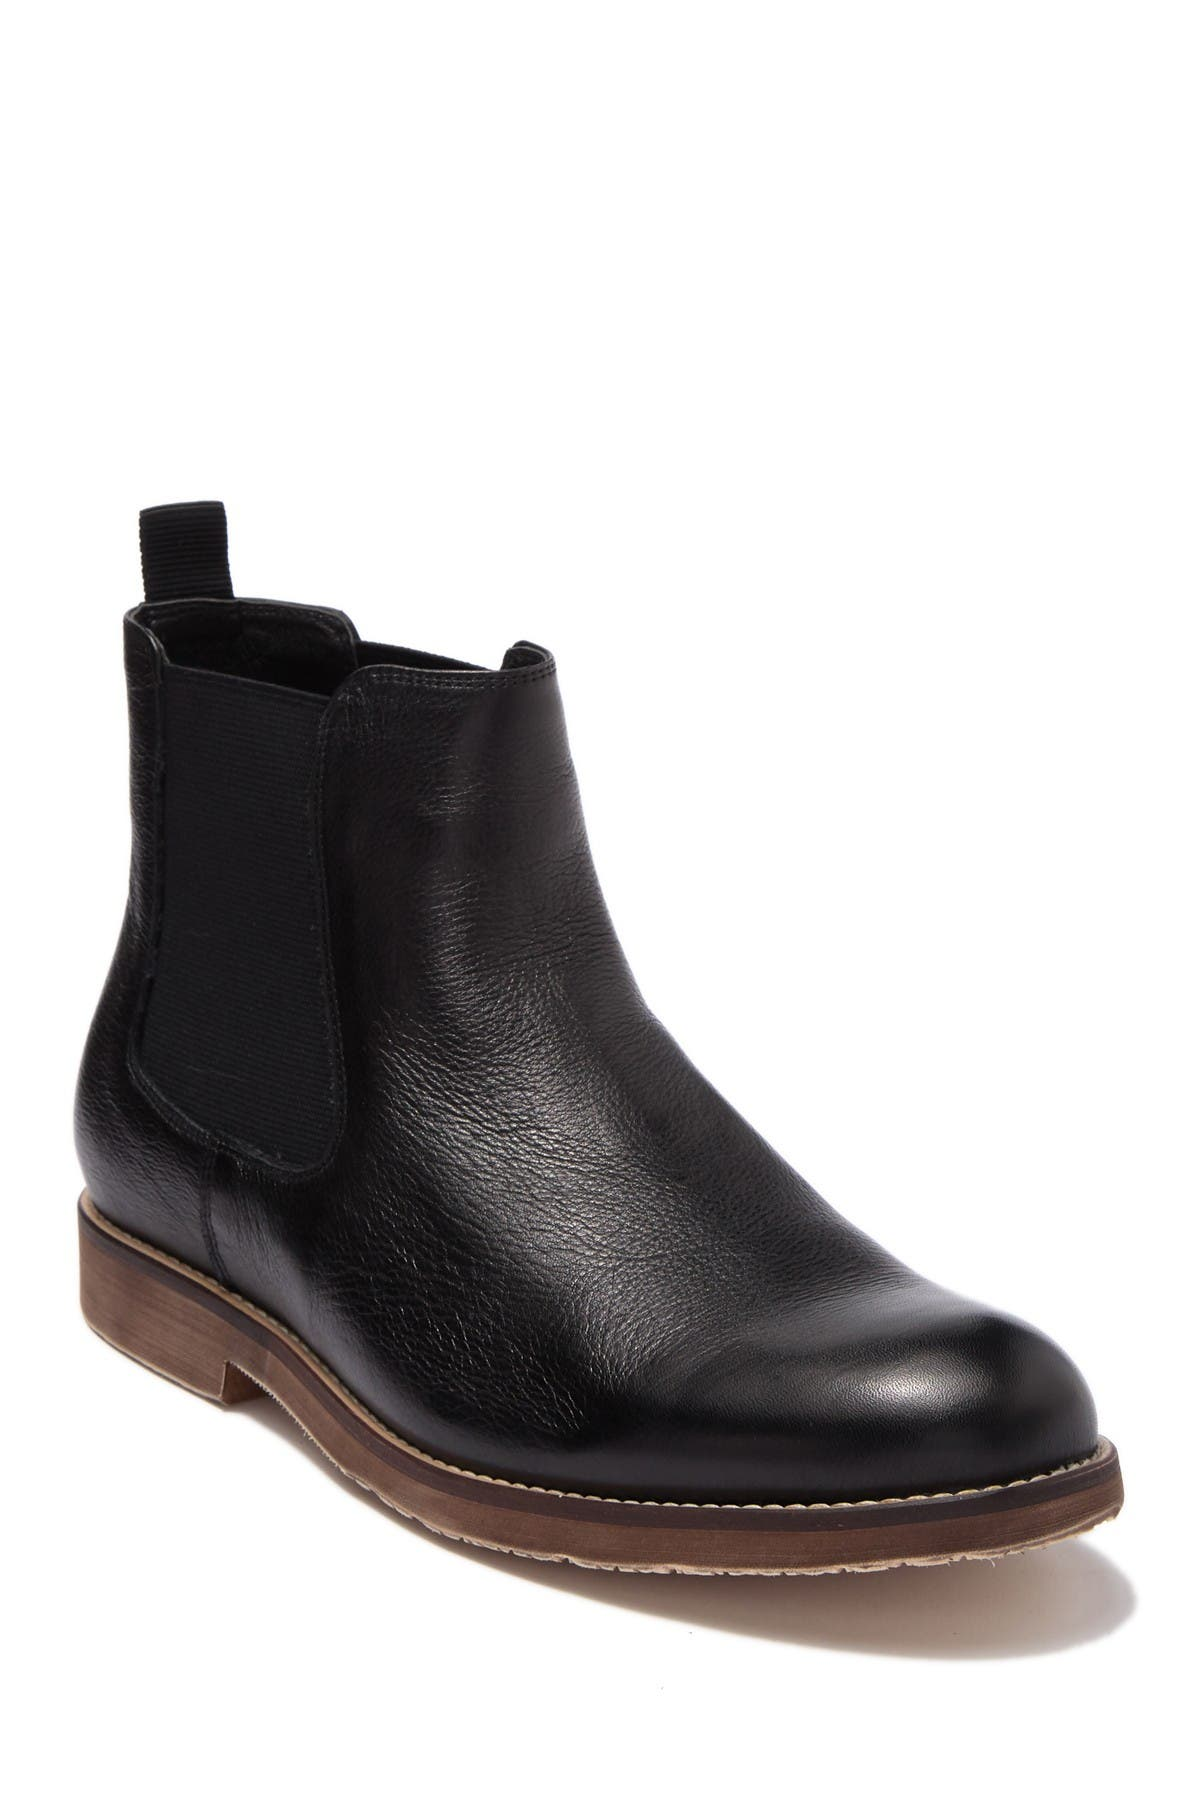 Image of English Laundry Marcus Leather Chelsea Boot